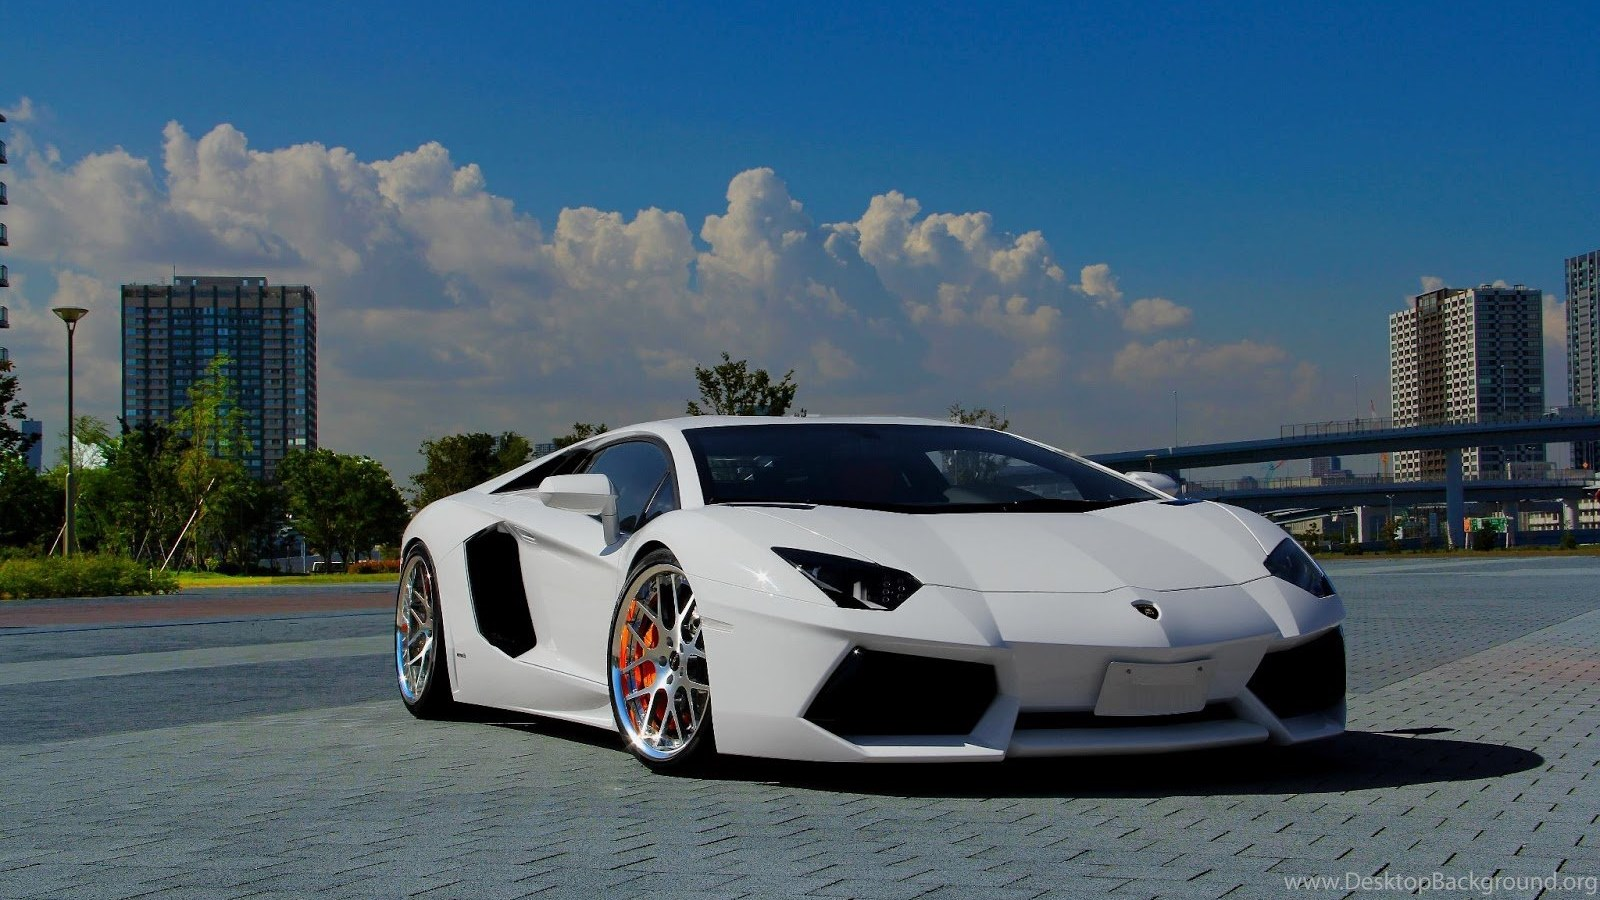 Lamborghini Aventador J In Whtie Colour Cars Wallpapers Hd Desktop